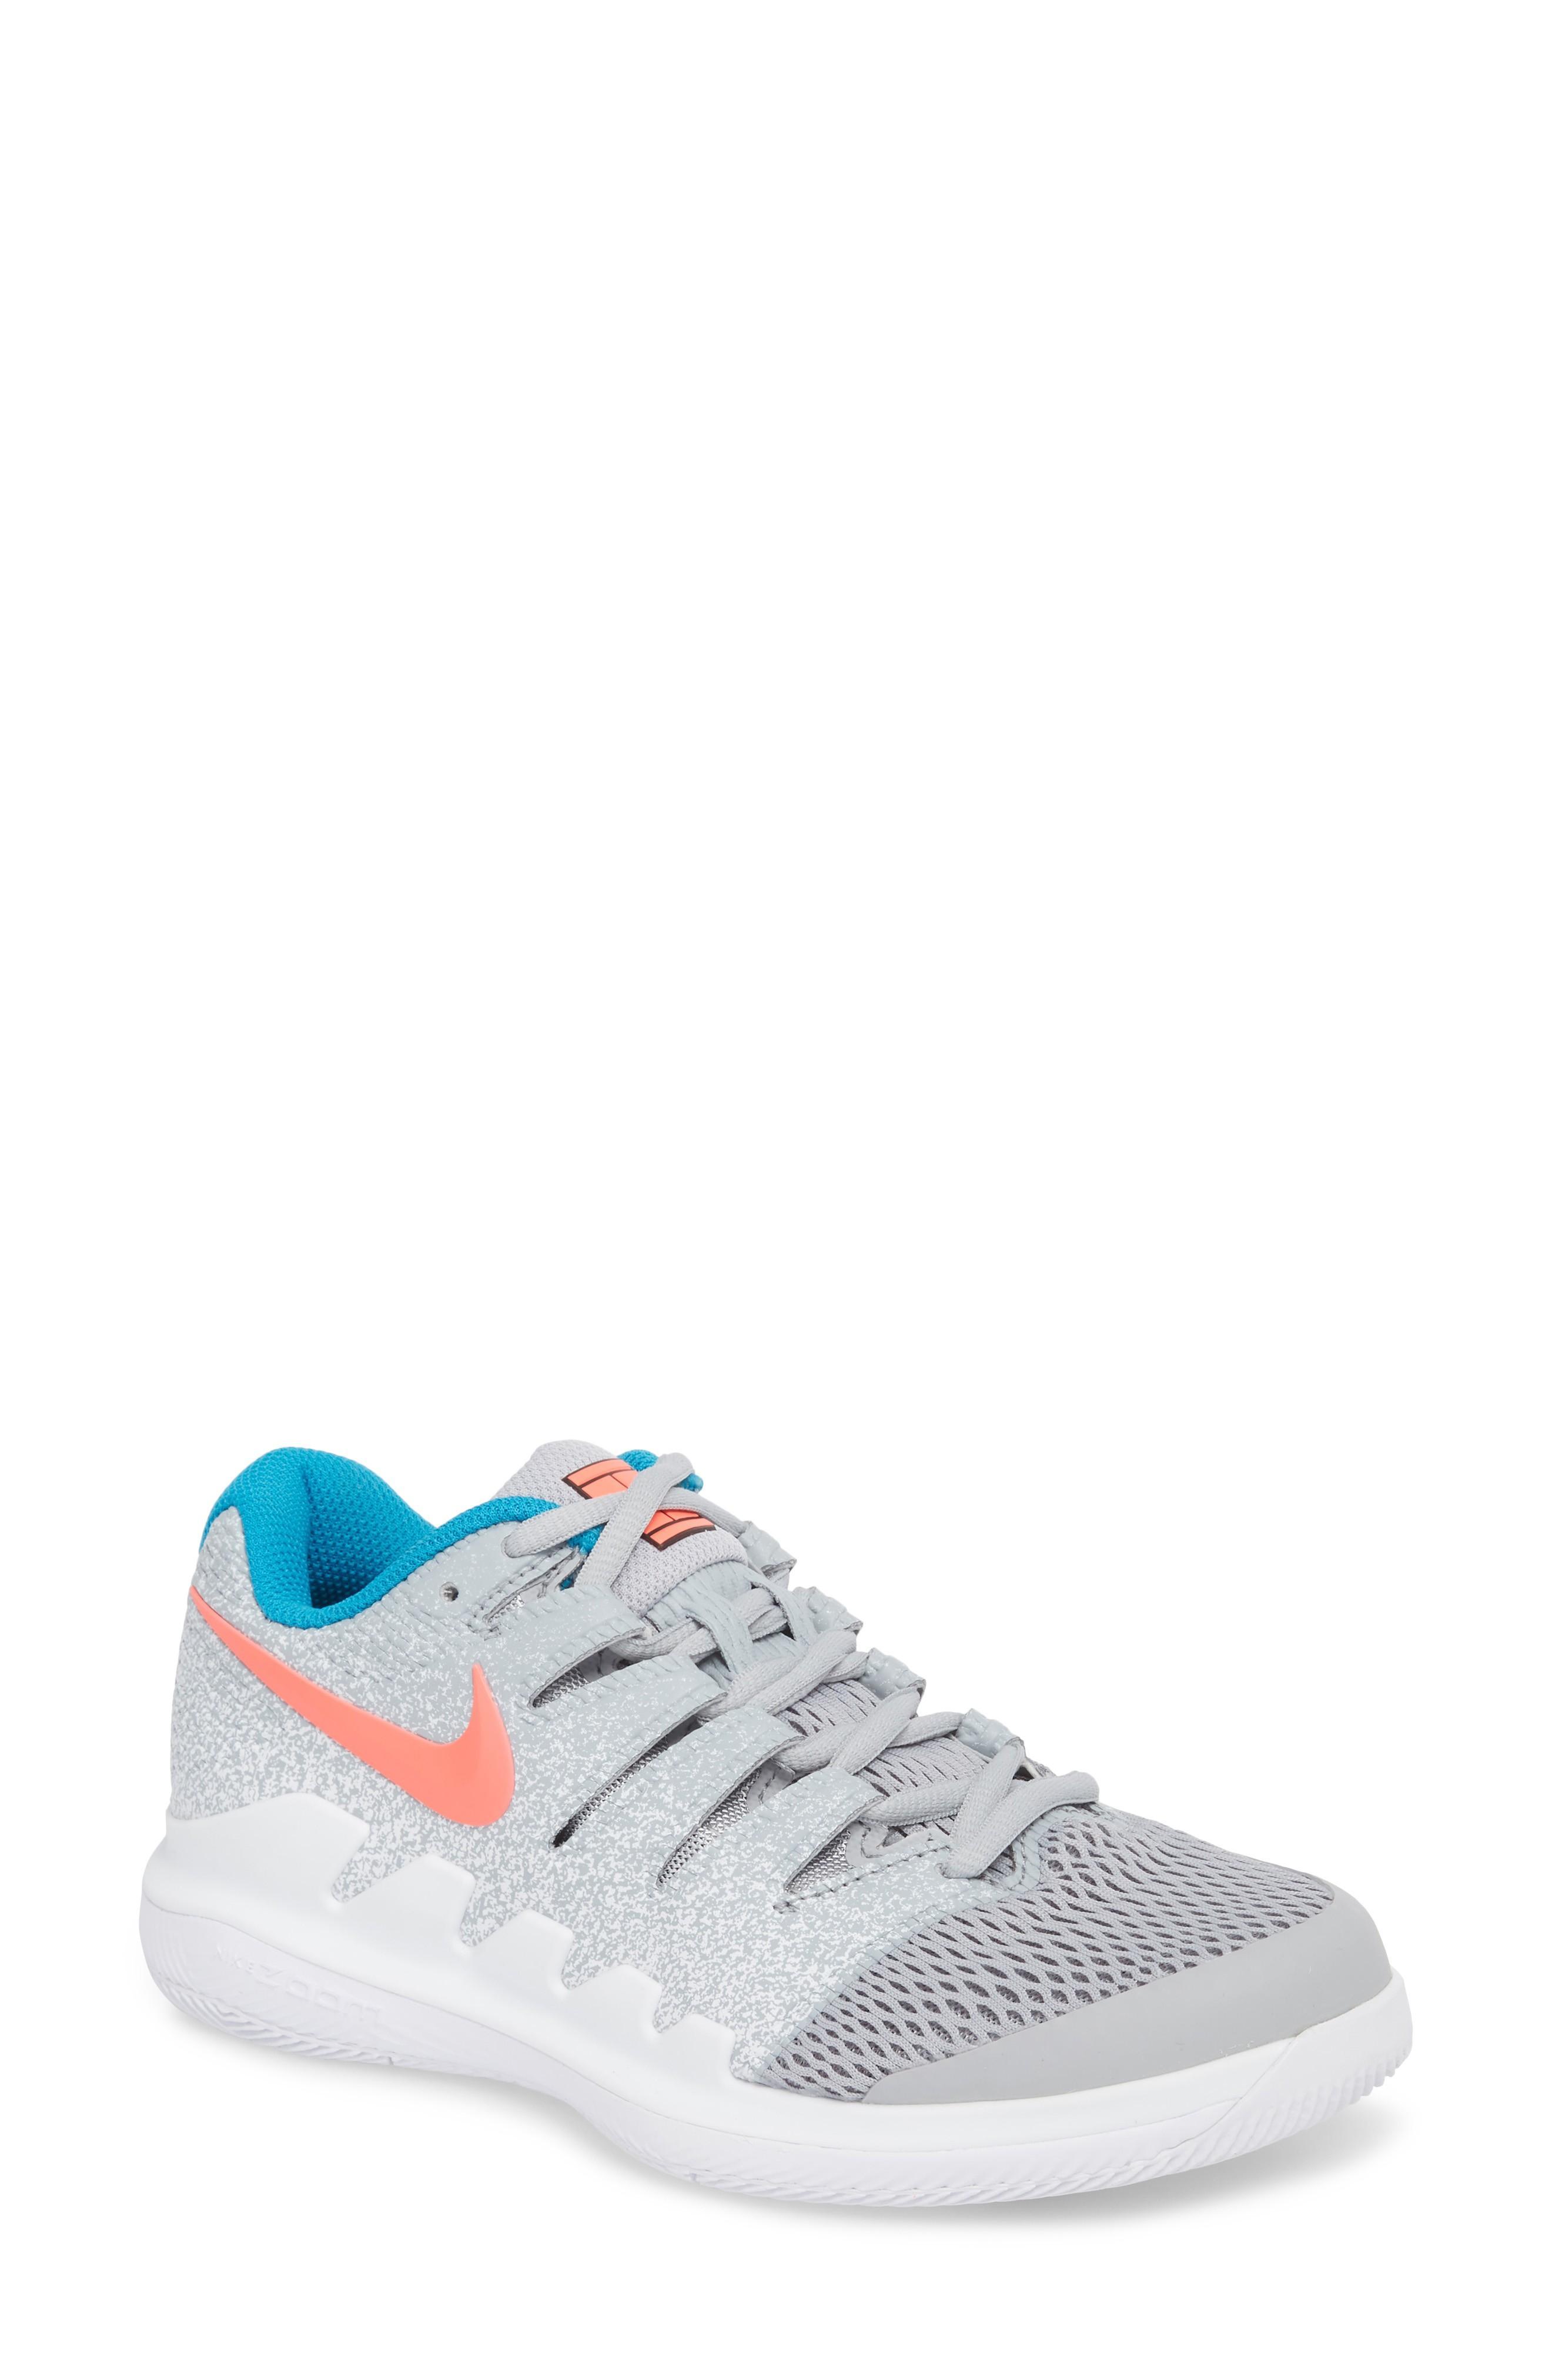 b964b571271b Nike Air Zoom Vapor X Tennis Shoe In Wolf Grey  Hot Lava